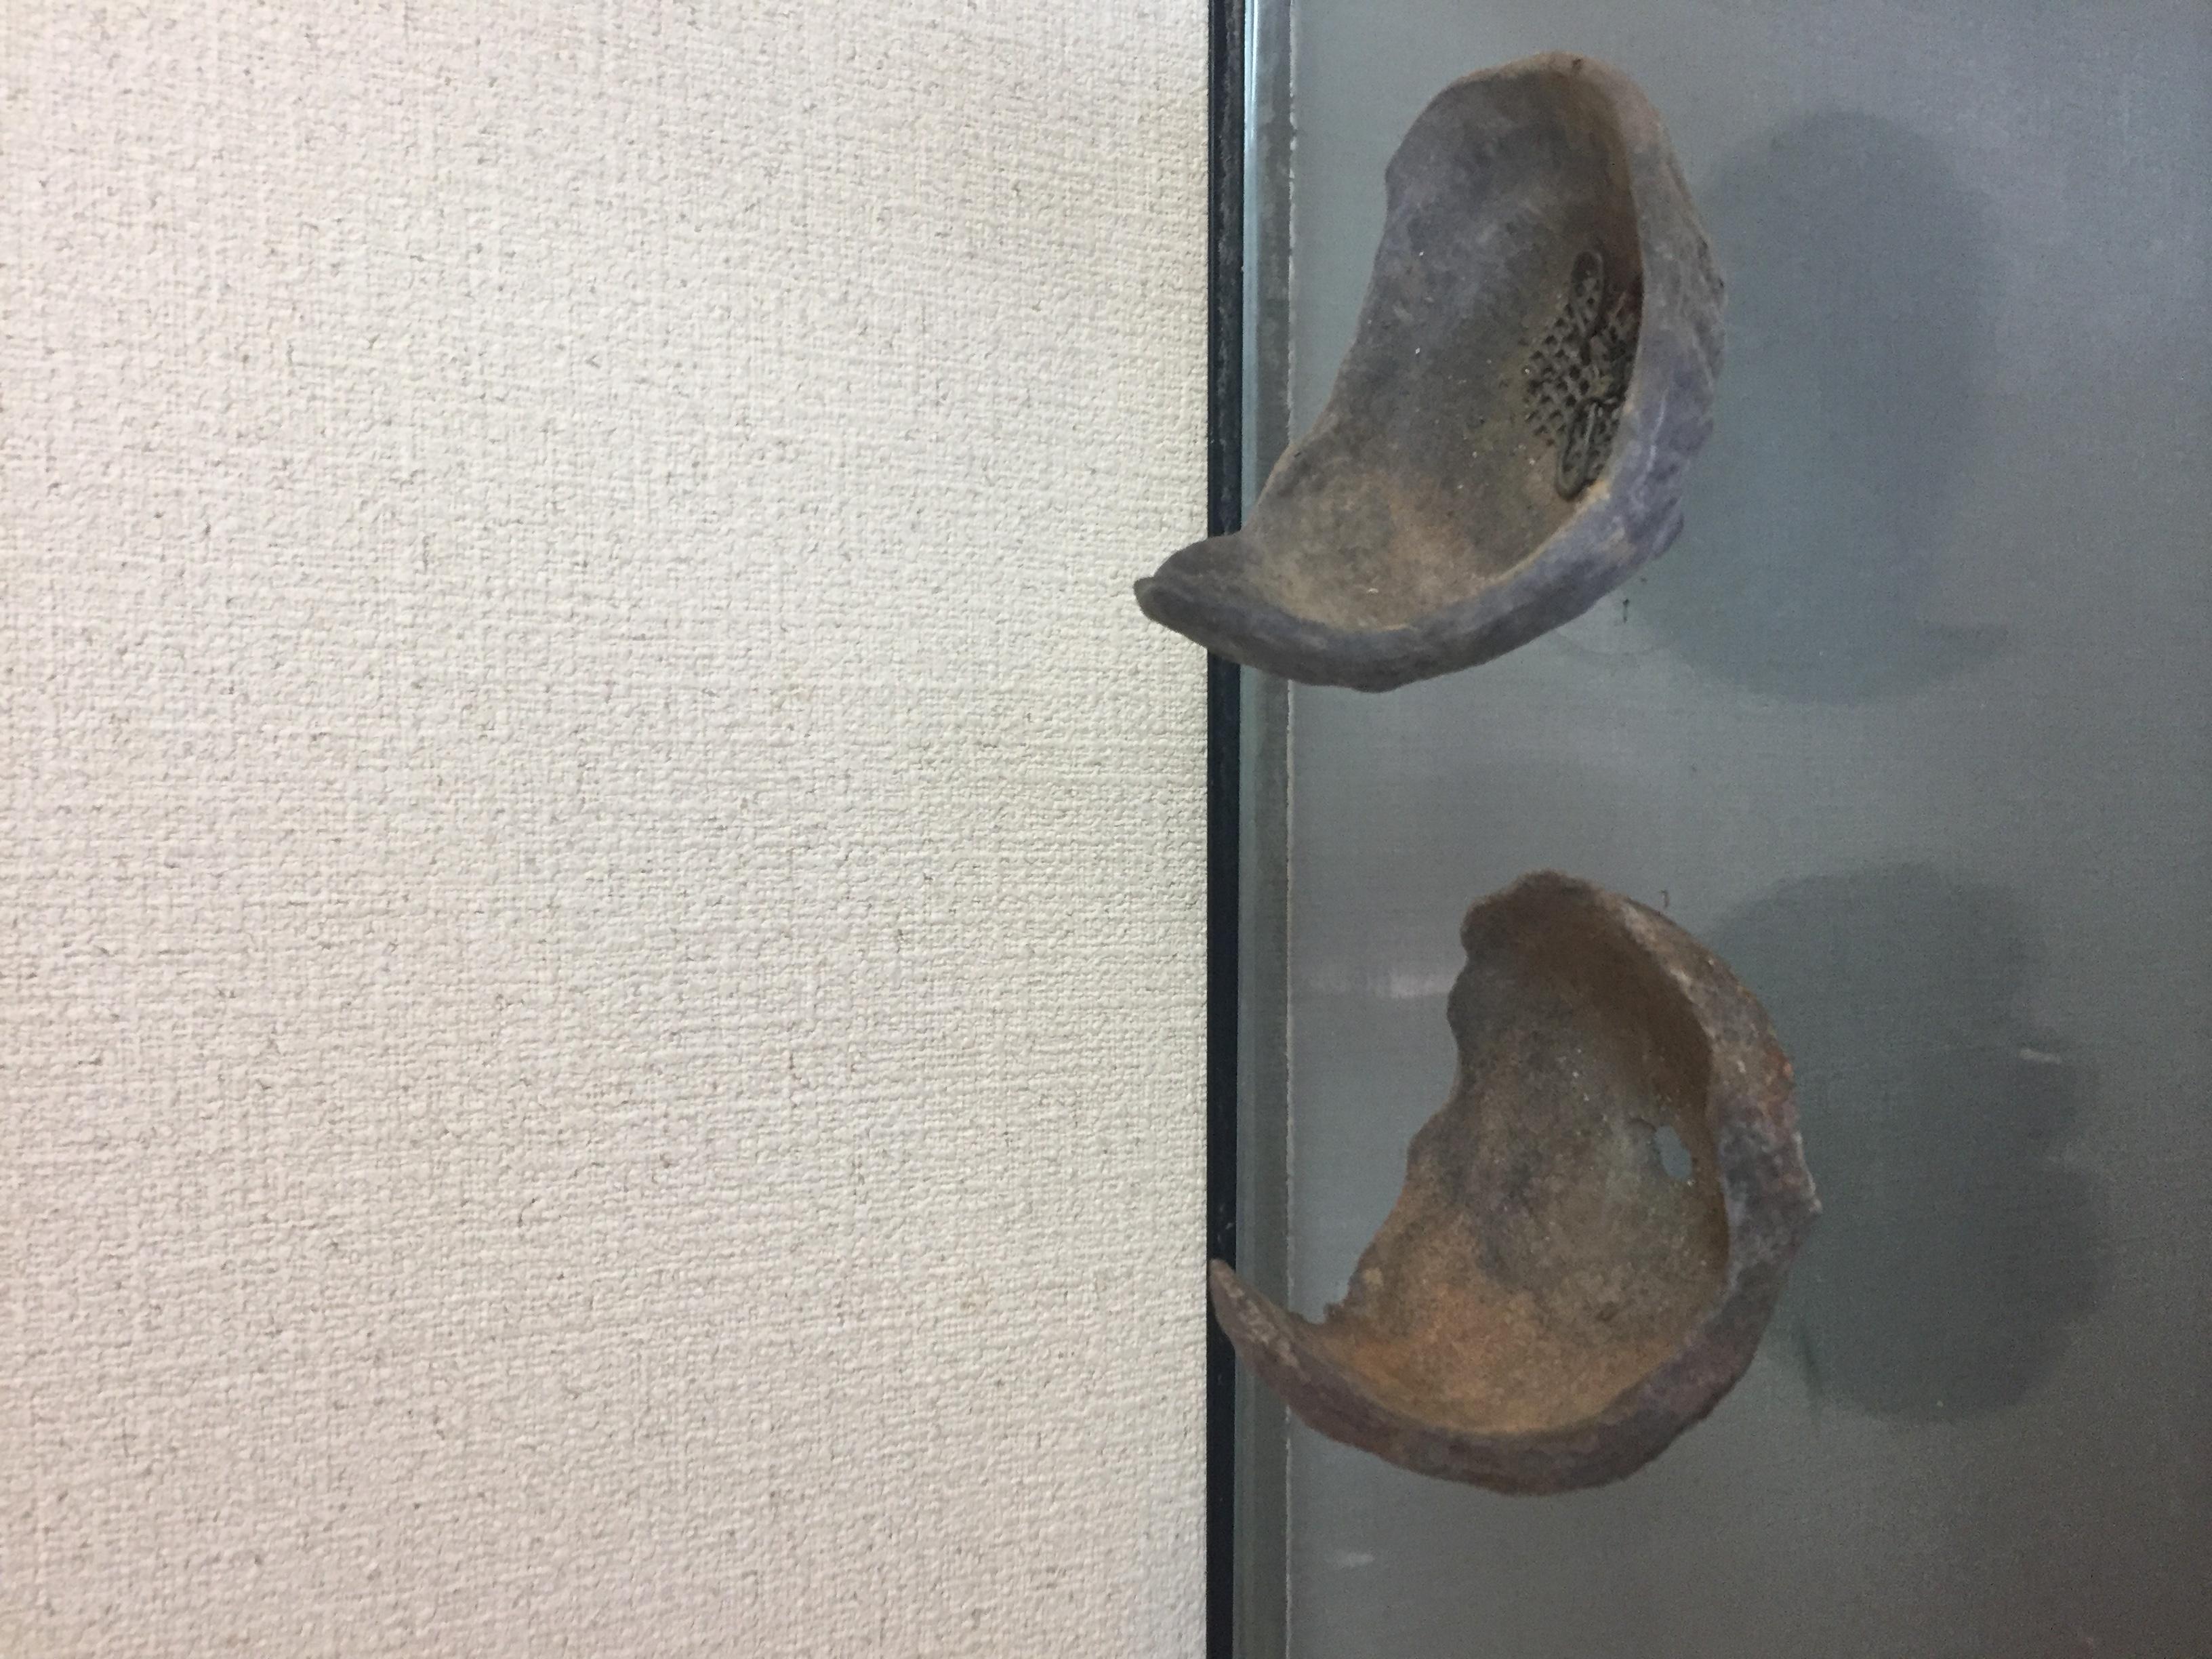 左:鞍馬石 右:鞍馬石風の鉢